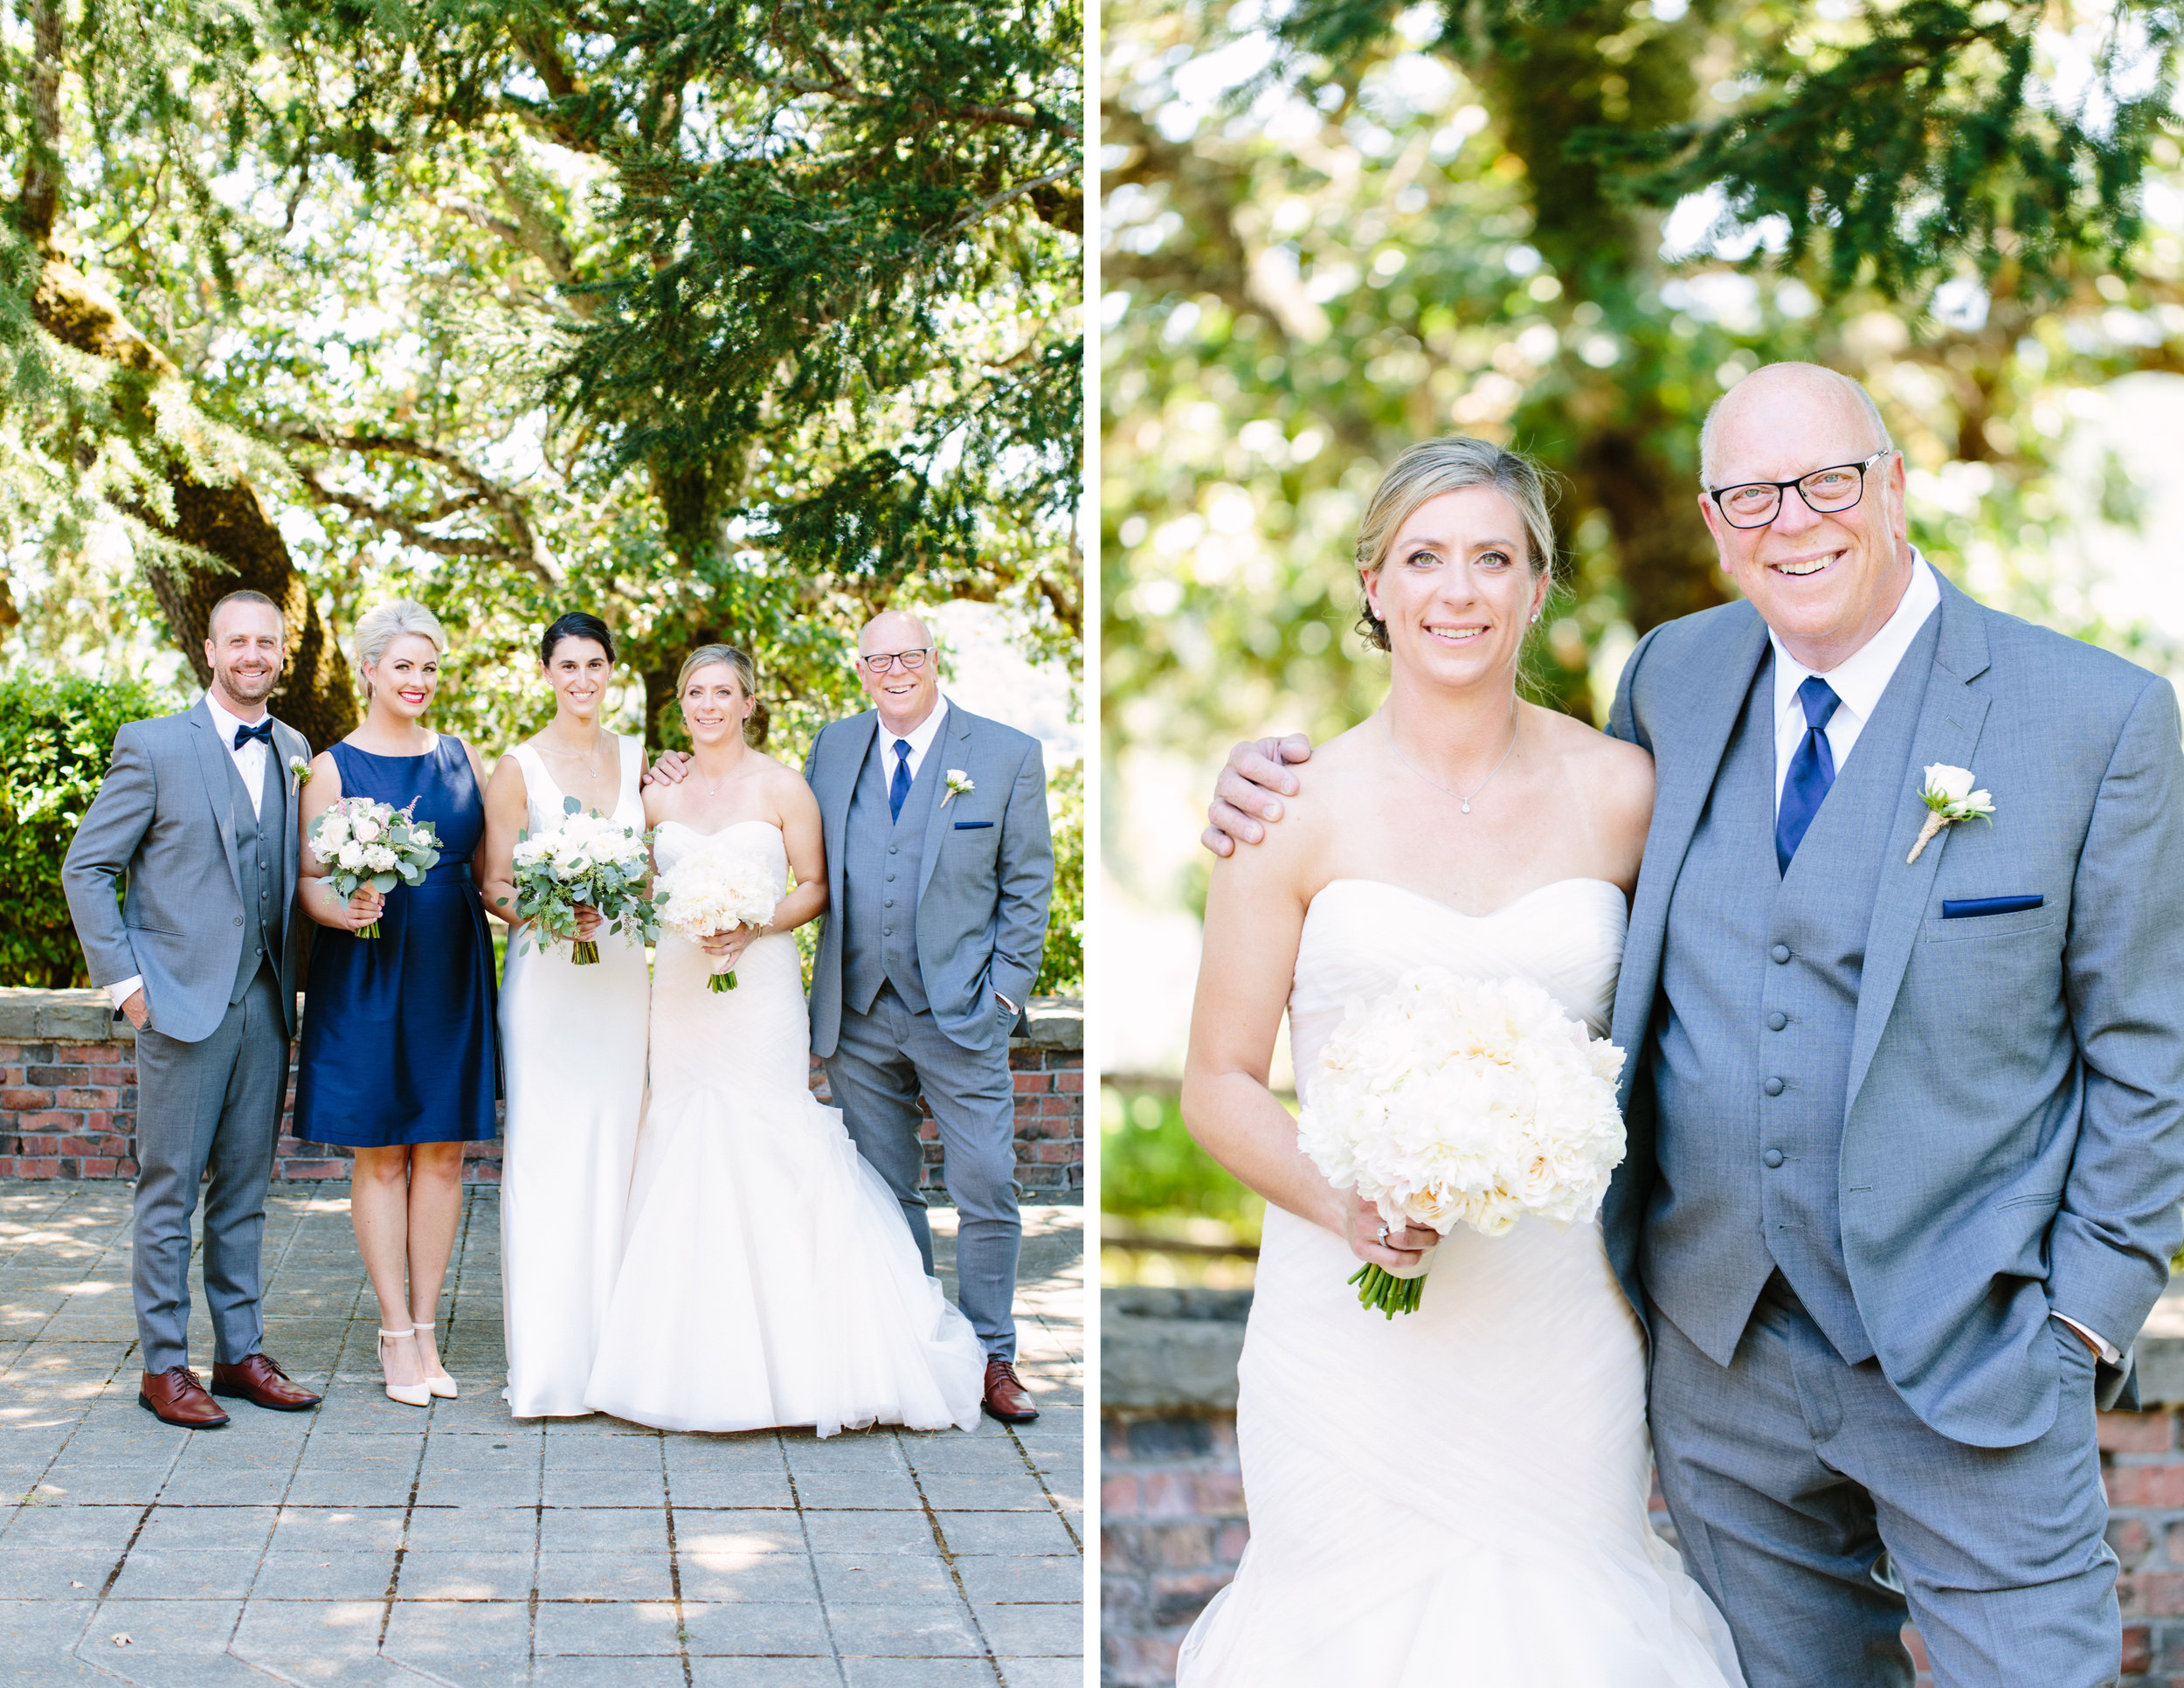 kunde estate winery wedding 7.jpg